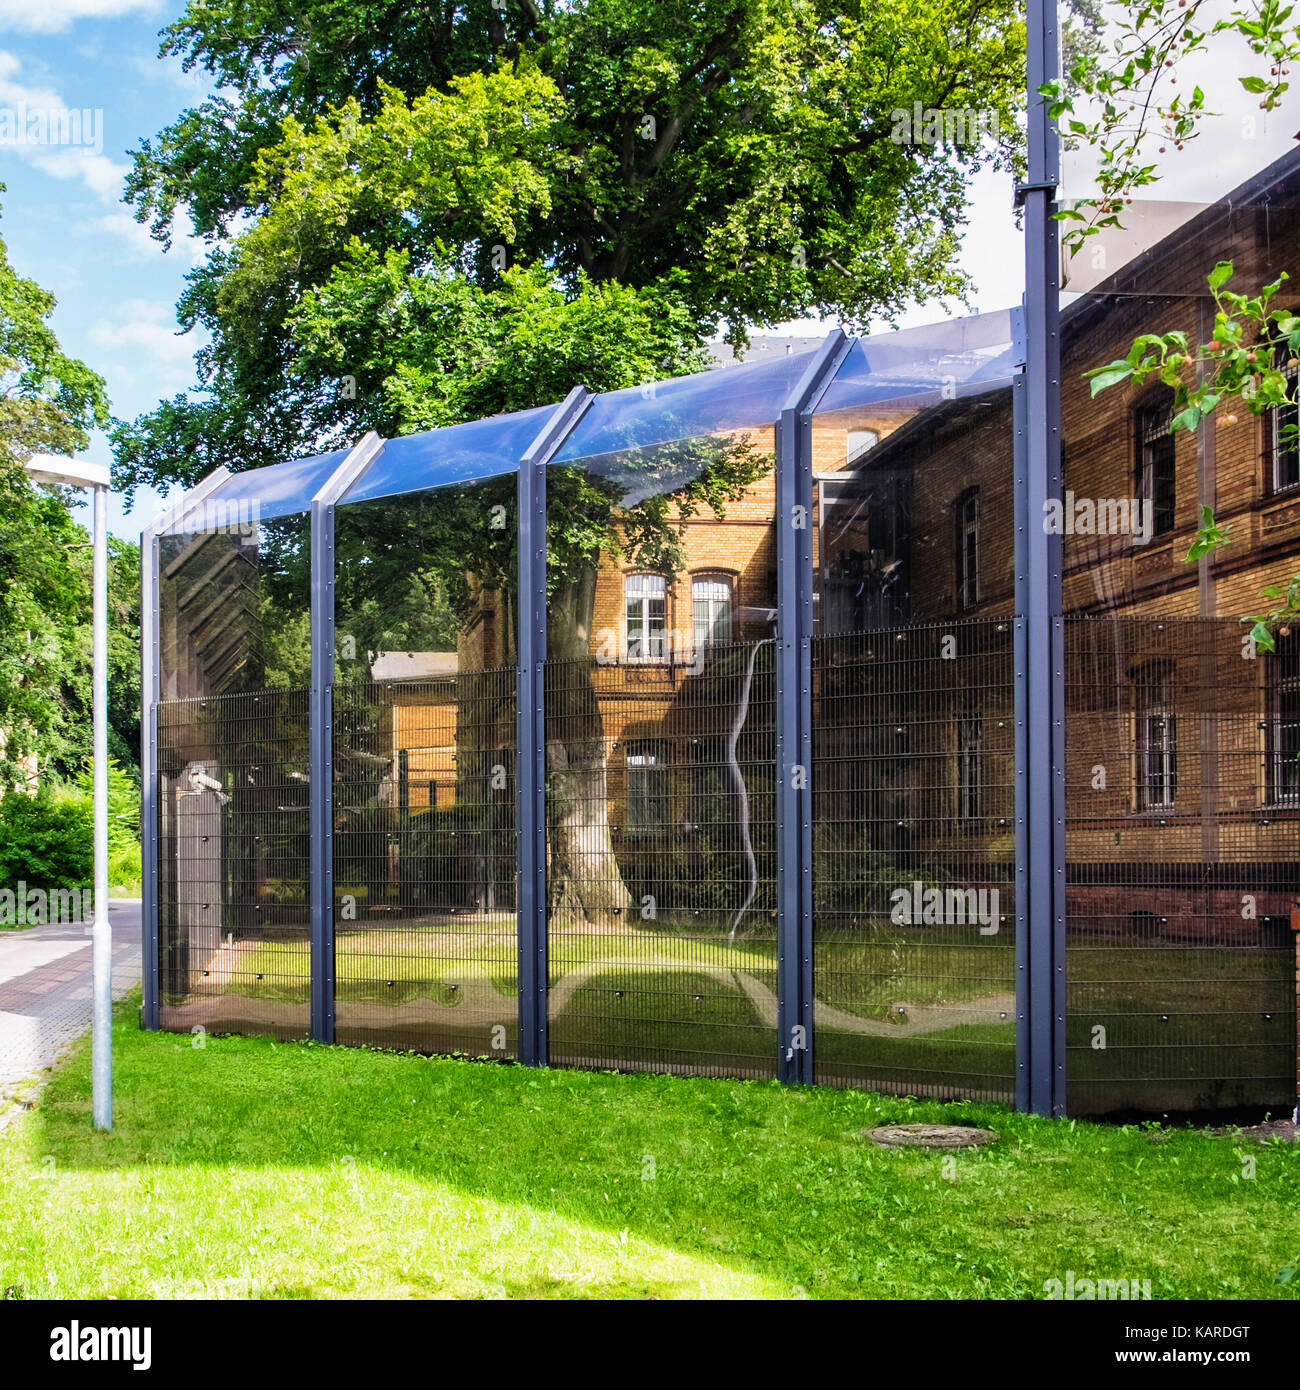 Berlin Karl-Bonhoeffer-Nervenklinik Psychiatric hospital KMV forensic department secure detention facility. Building - Stock Image